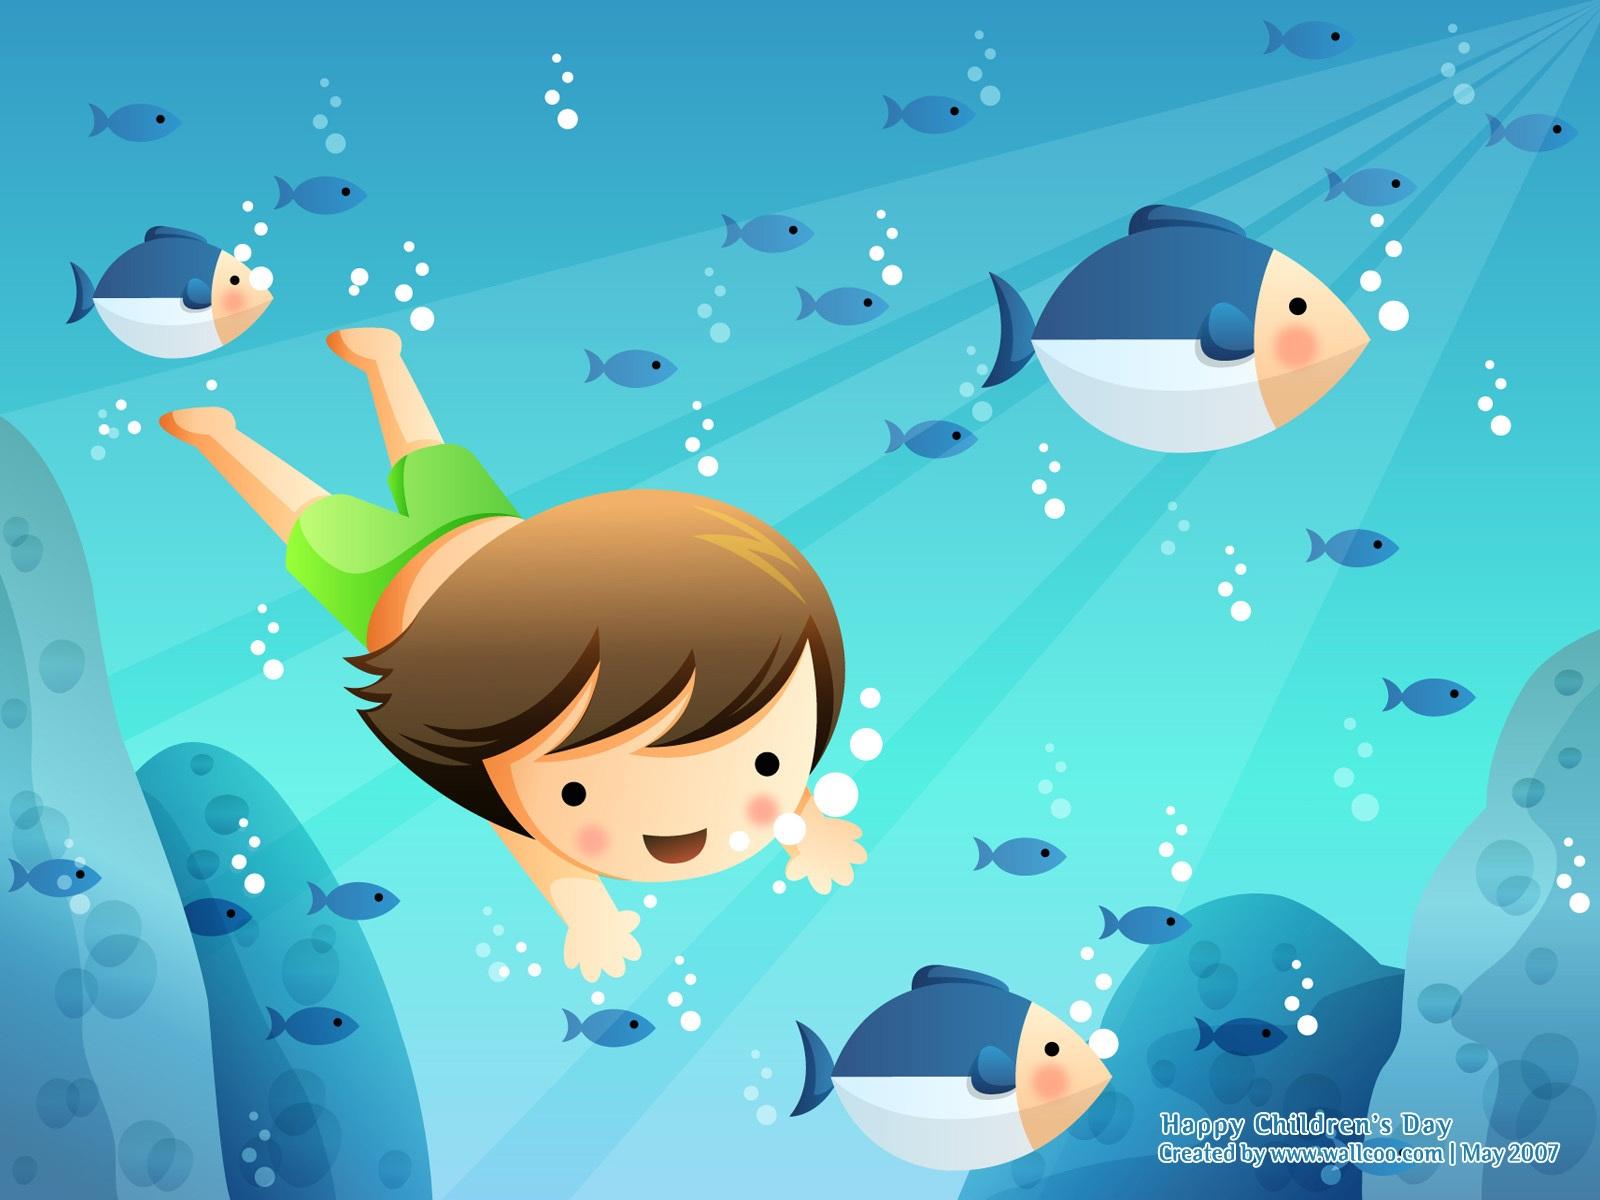 Best Wallpapers For Kids: Wallpaper: Wallpaper Uk Children